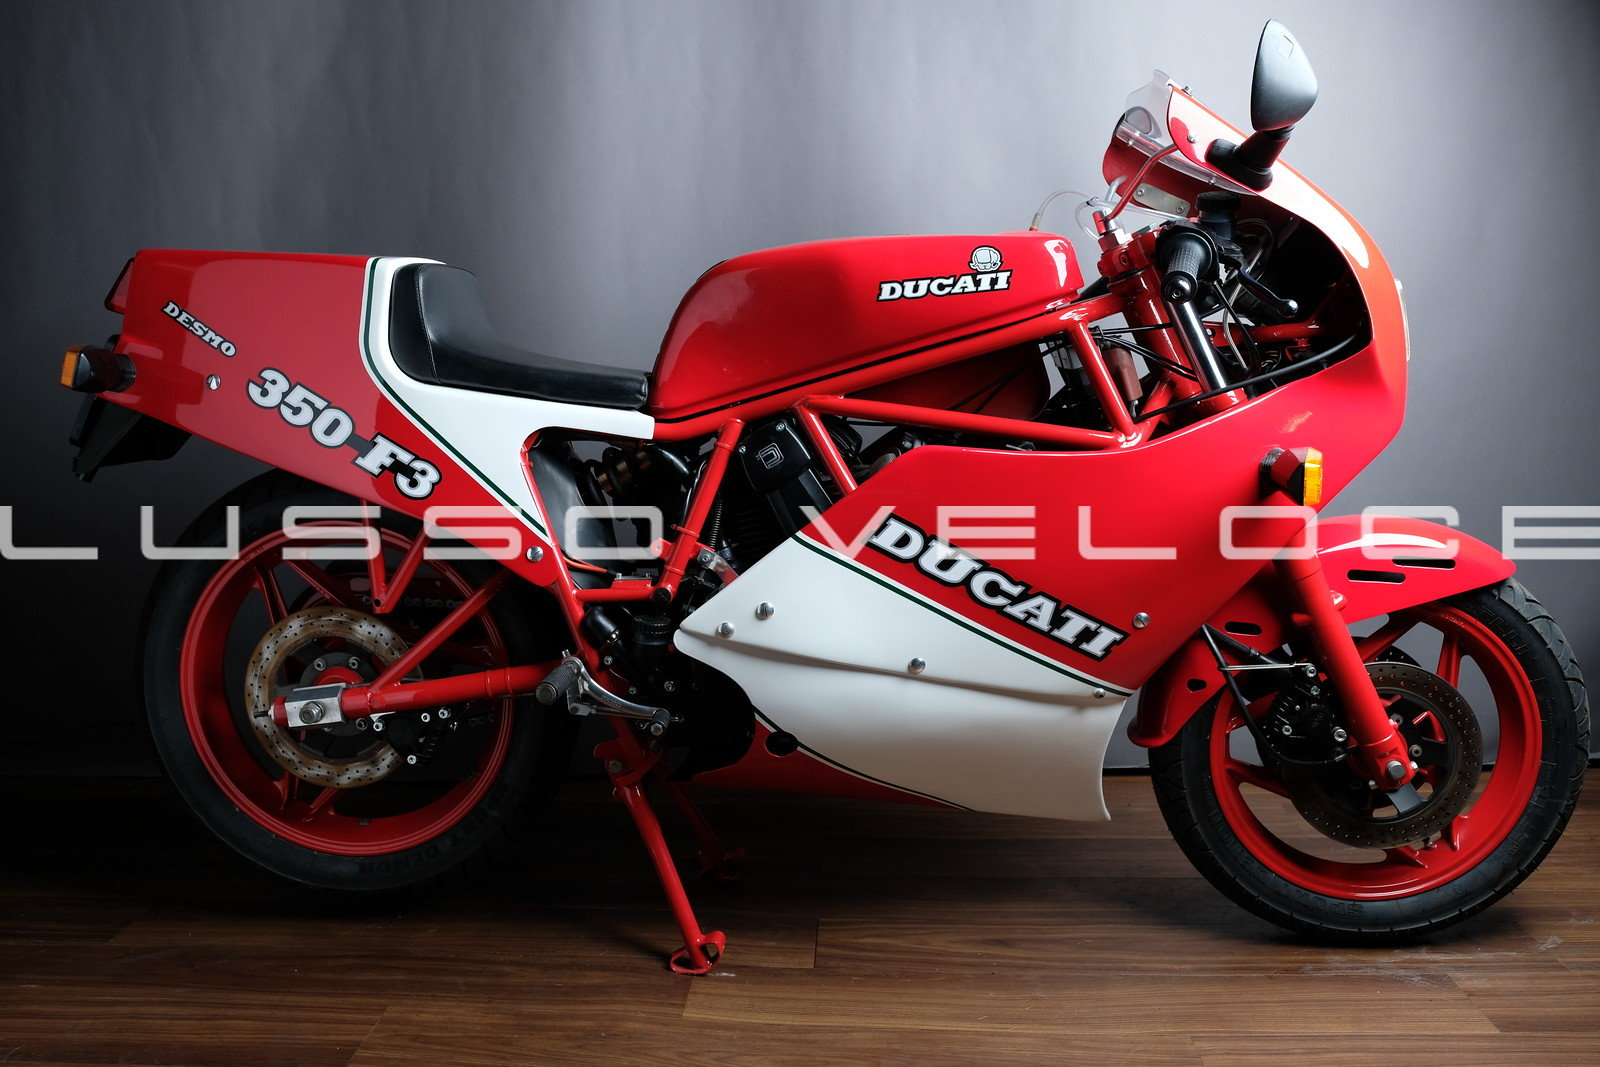 1986 Rare Ducati F3 350 fully restored For Sale (picture 1 of 15)